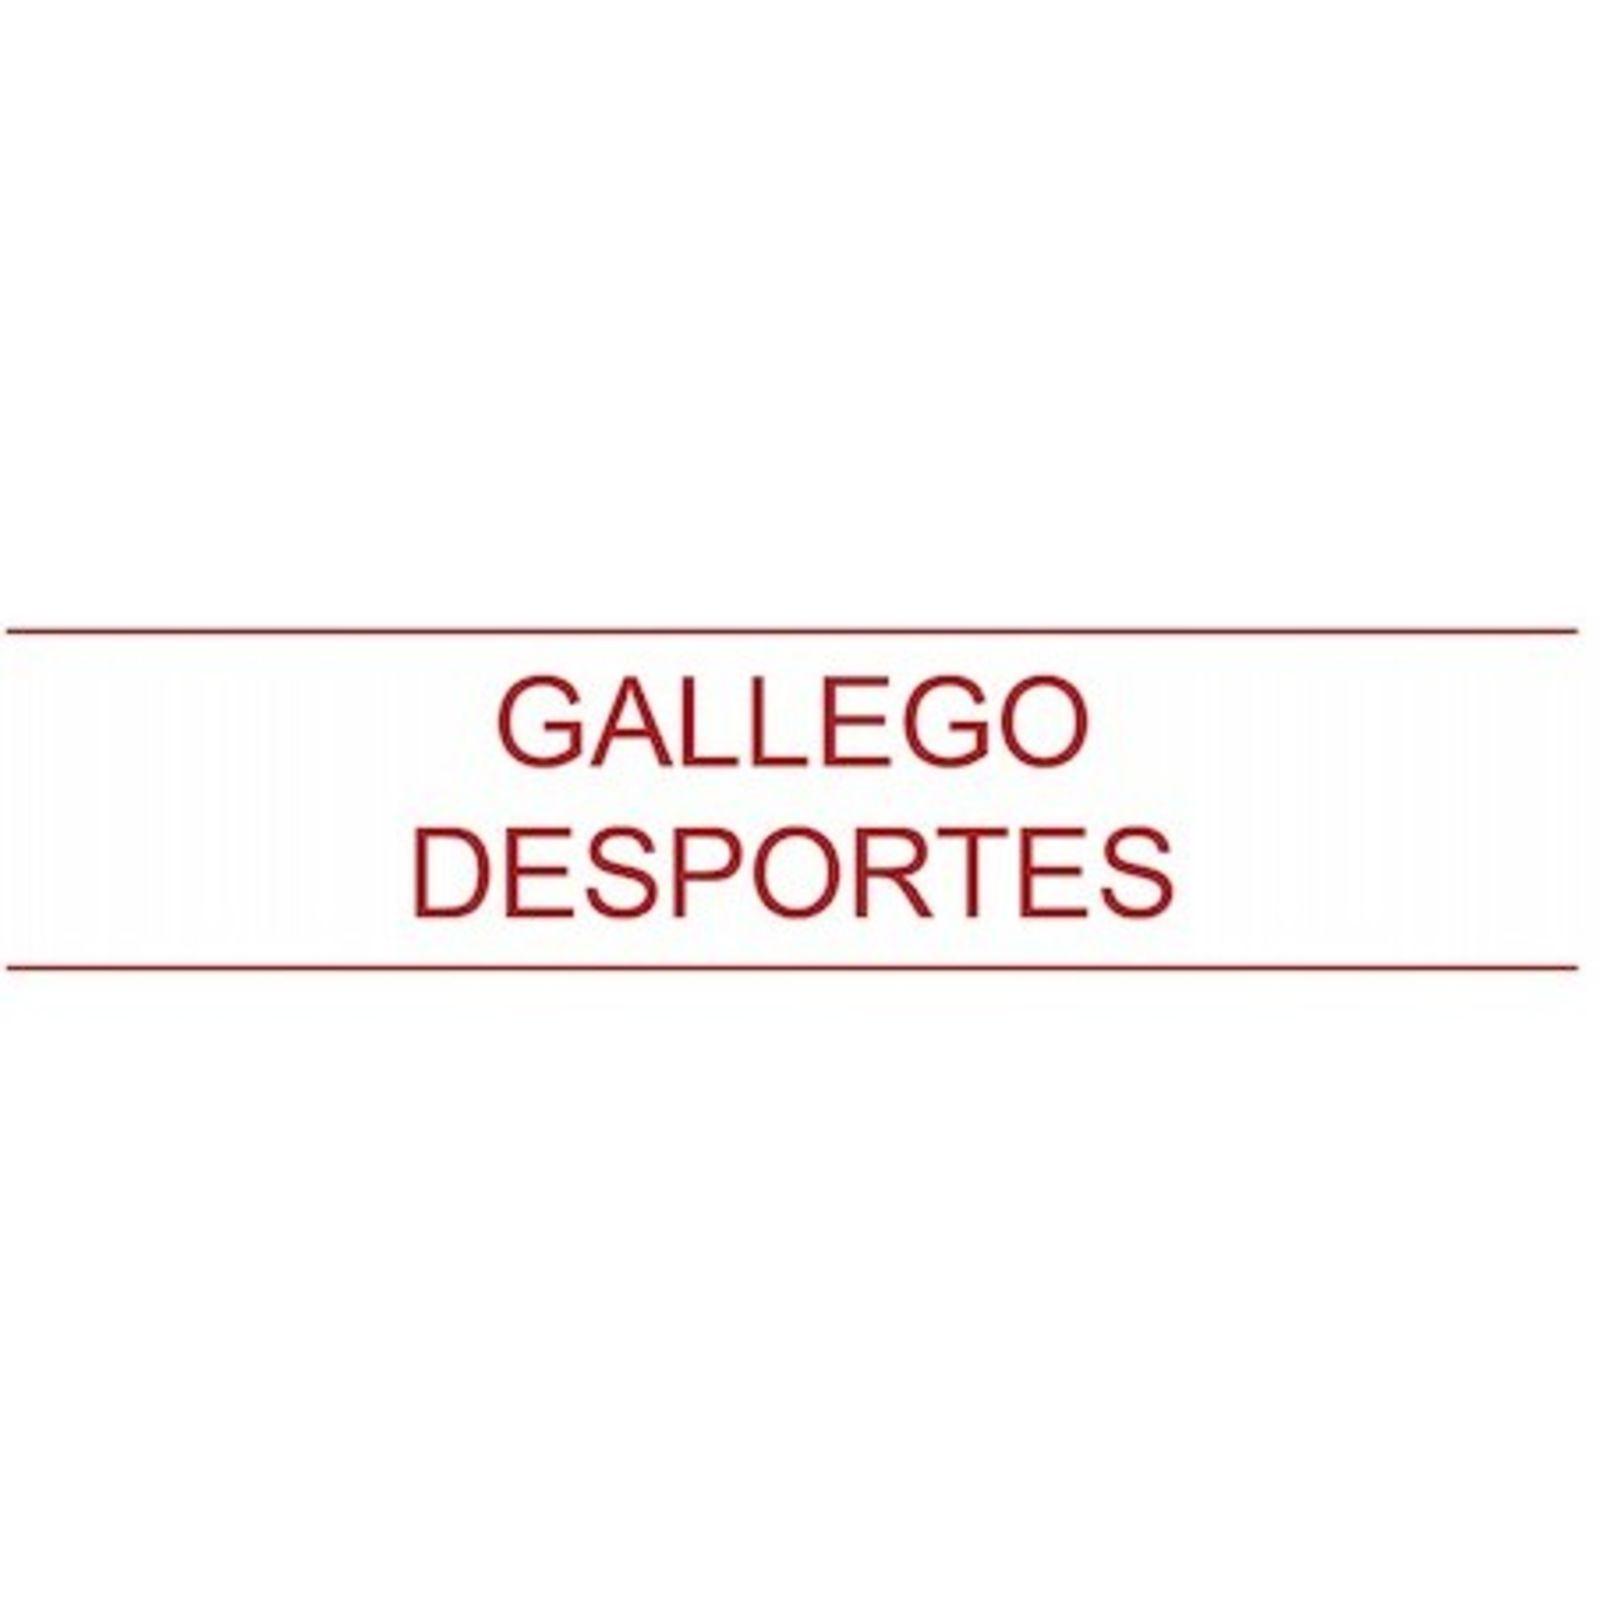 GALLEGO DESPORTES